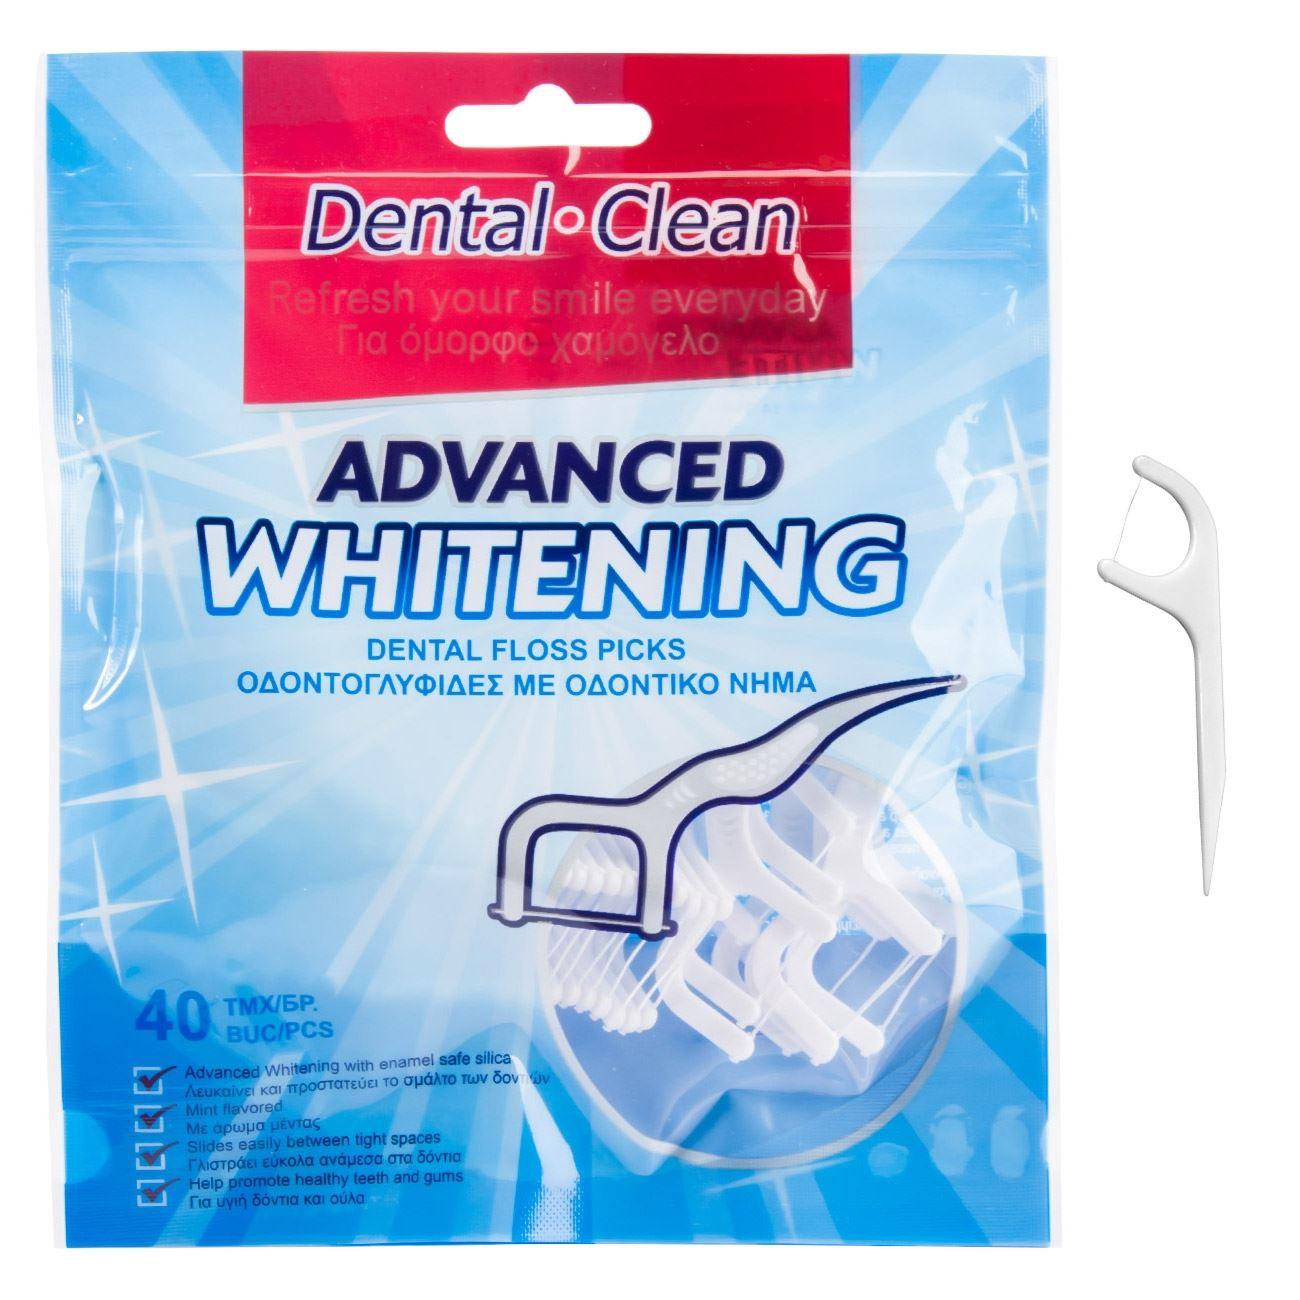 0757646bcaa Οδοντογλυφίδες με Οδοντικό Νήμα Whitening - 40 τμχ. < Οδοντονήματα ...